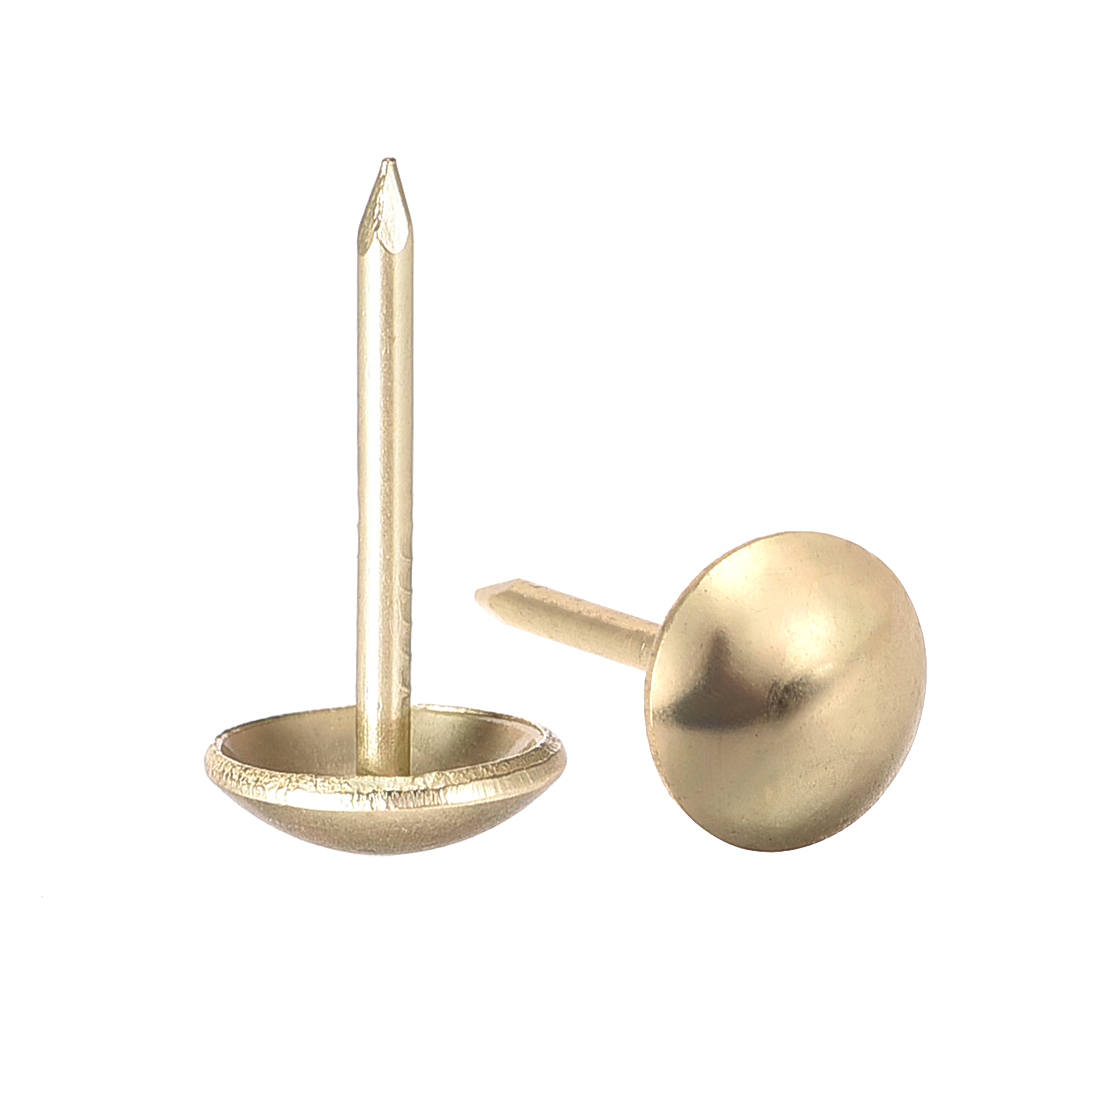 Upholstery Nails Tacks 9mm Dia 17mm Height Round Push Pins Gold Tone 30 Pcs